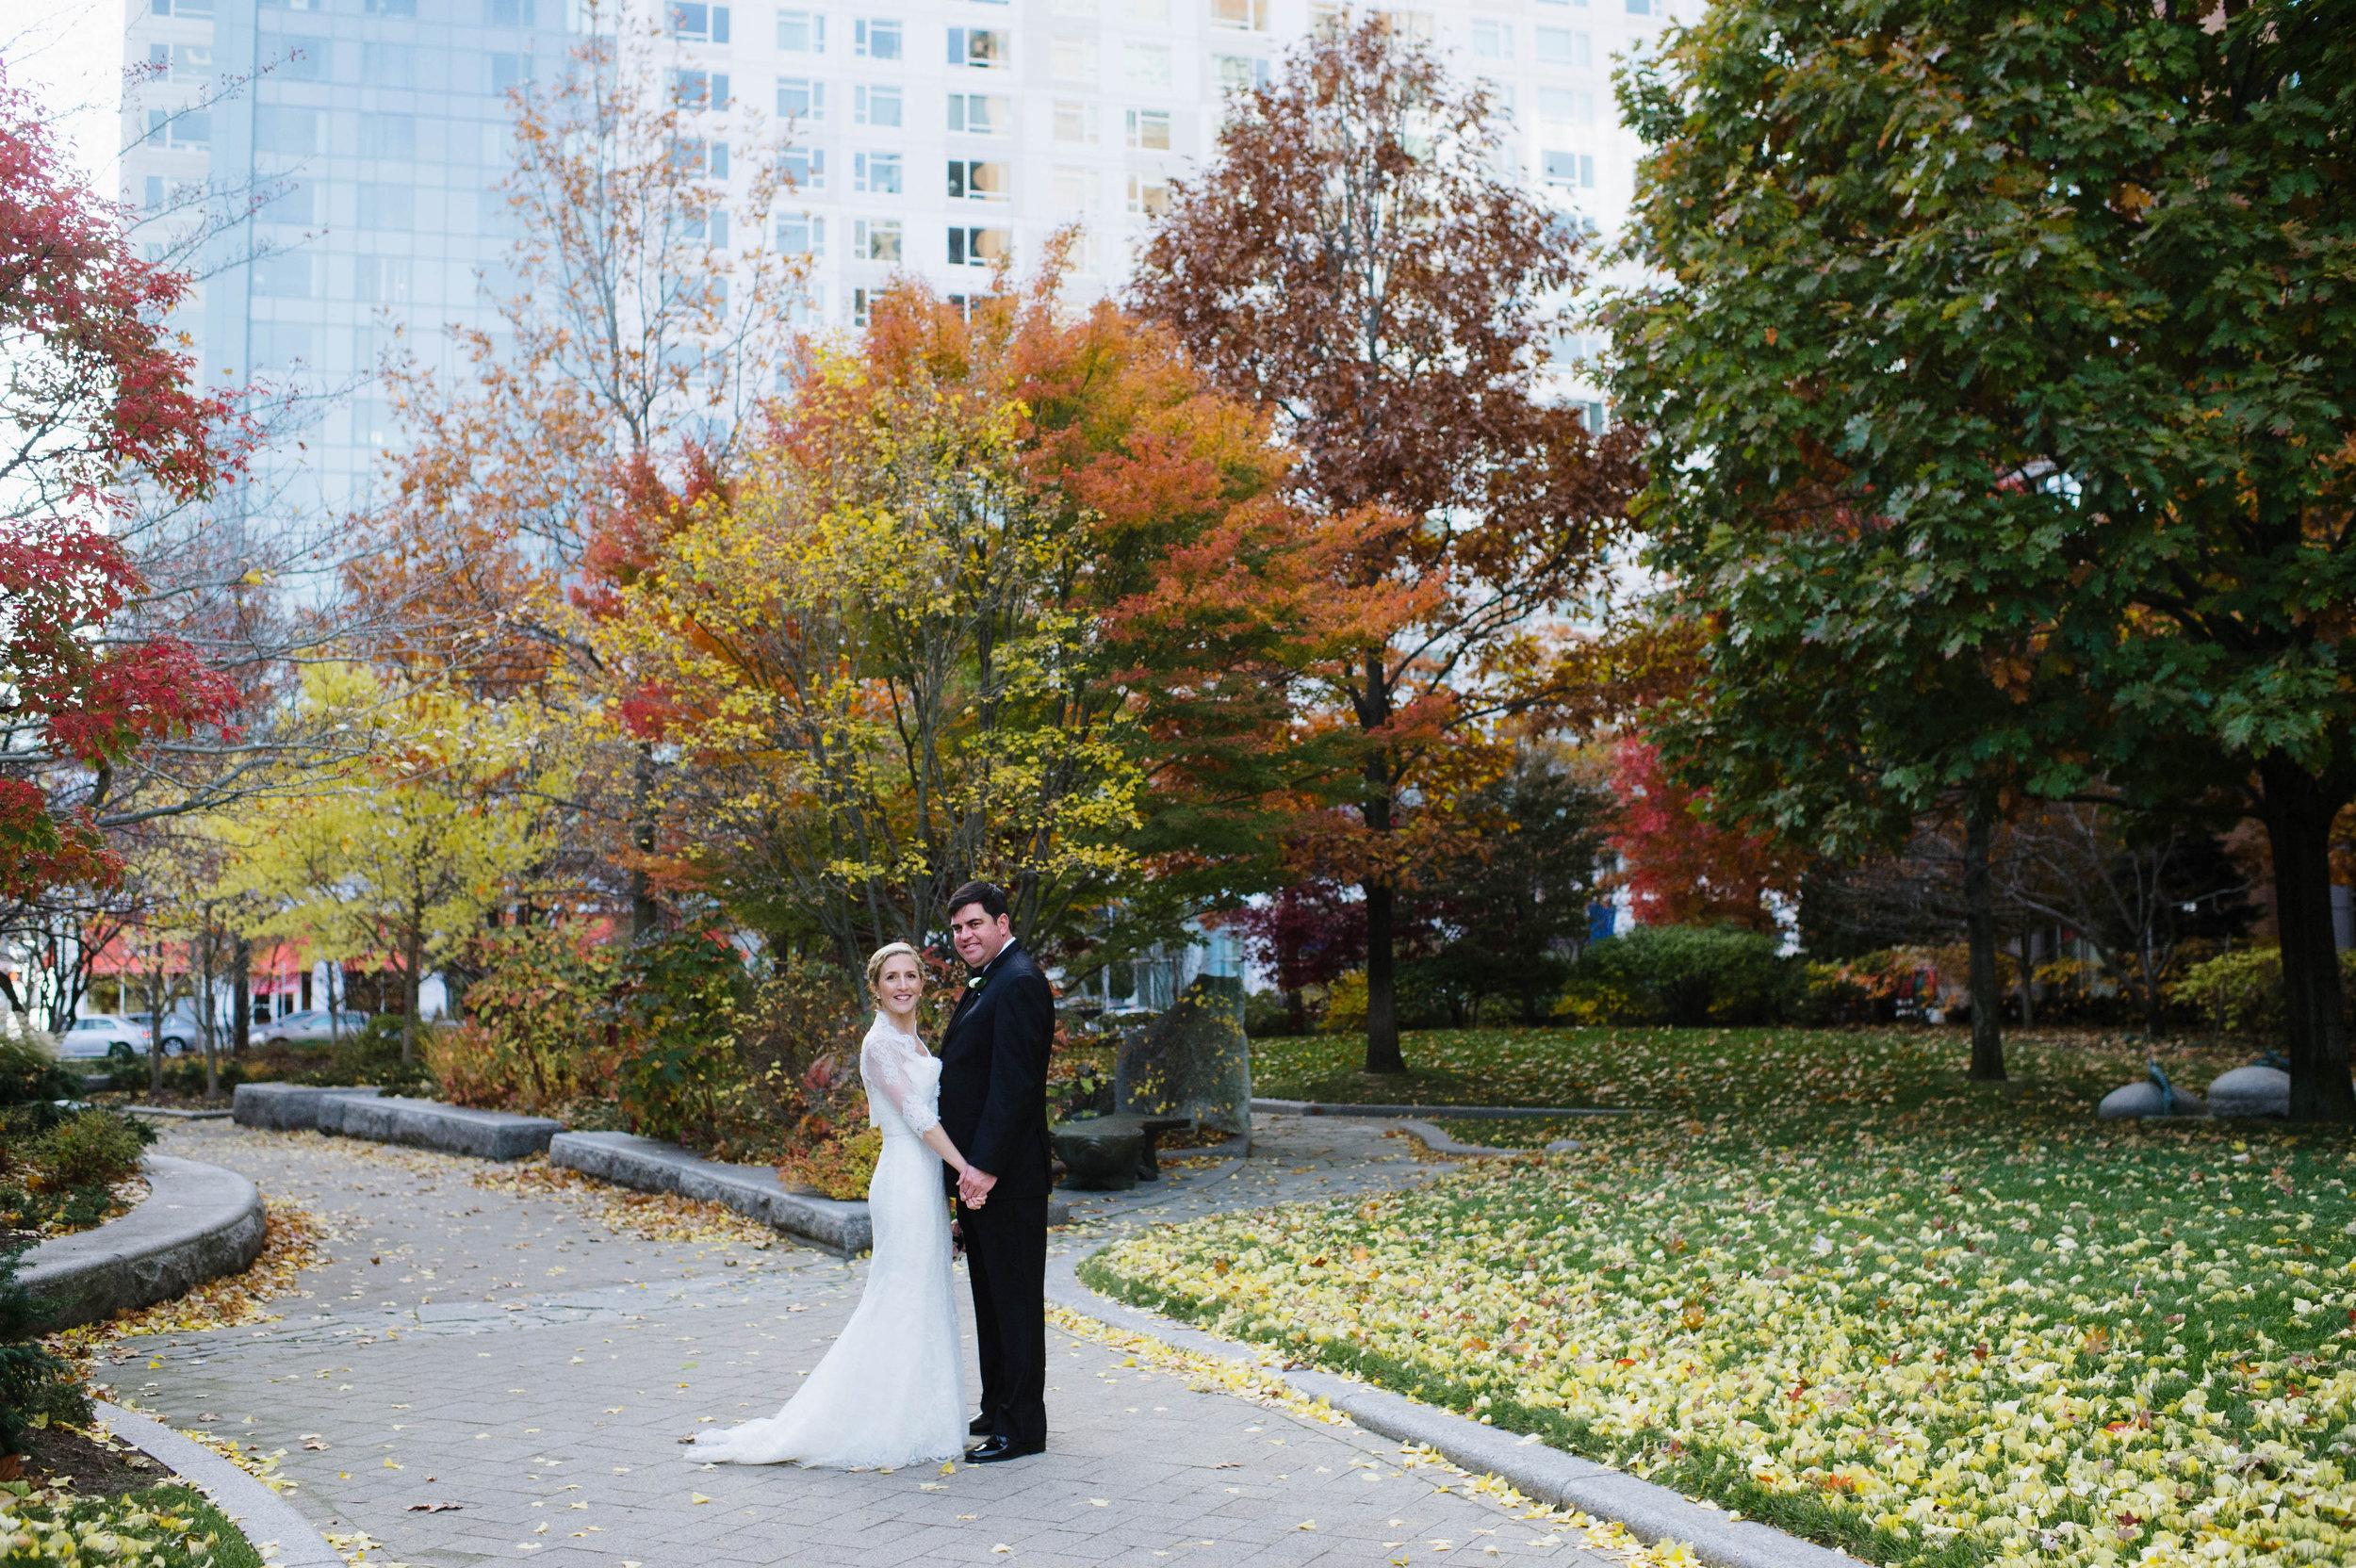 Creative-Wedding-Photography-Boston25.jpg